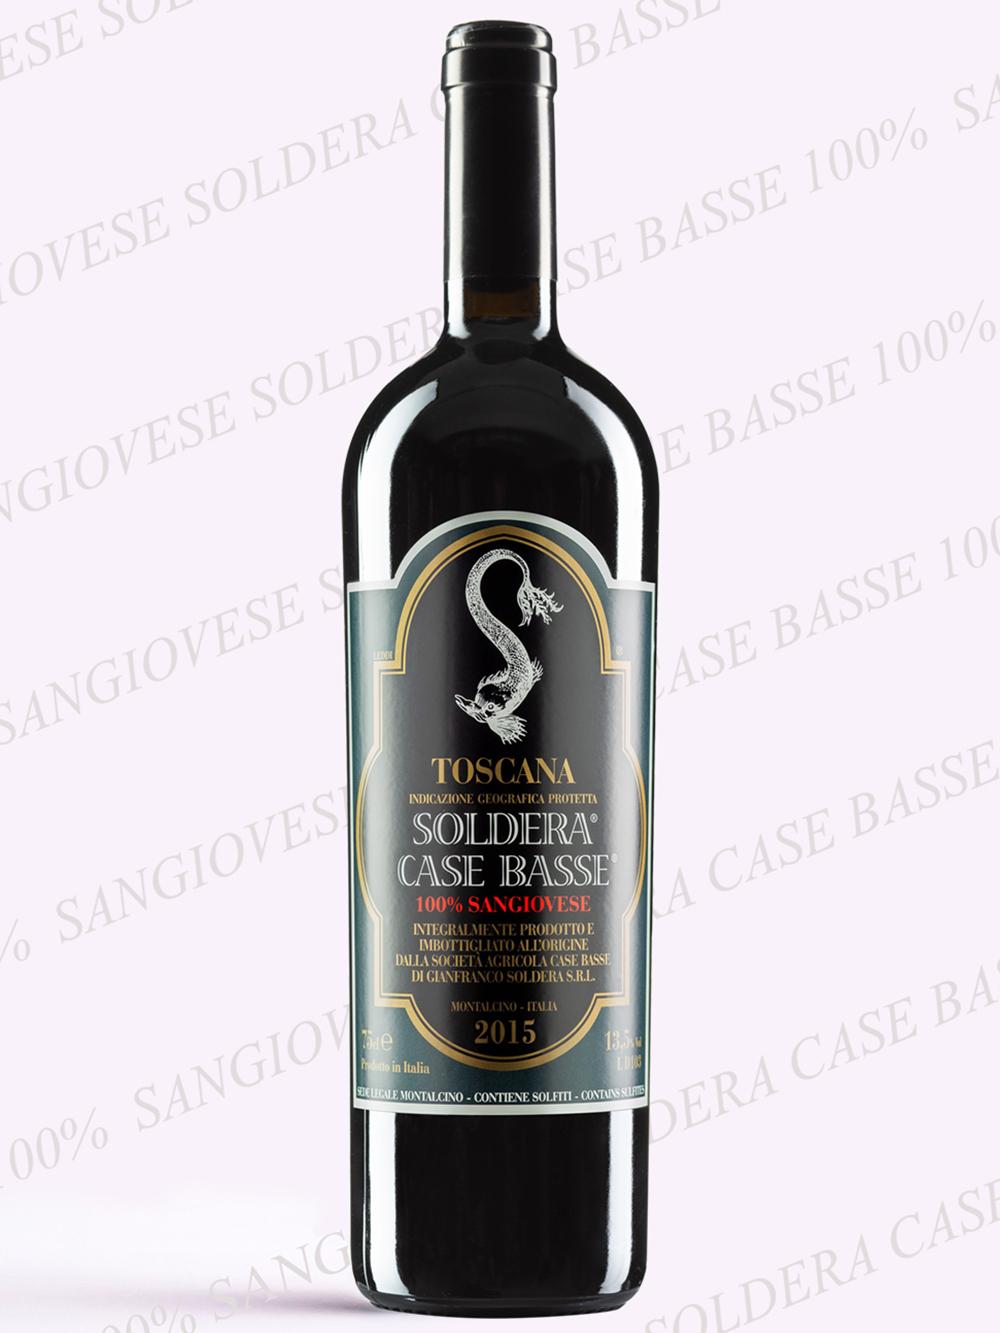 Toscane IGP 100% Sangiovese Soldera® Case Basse®